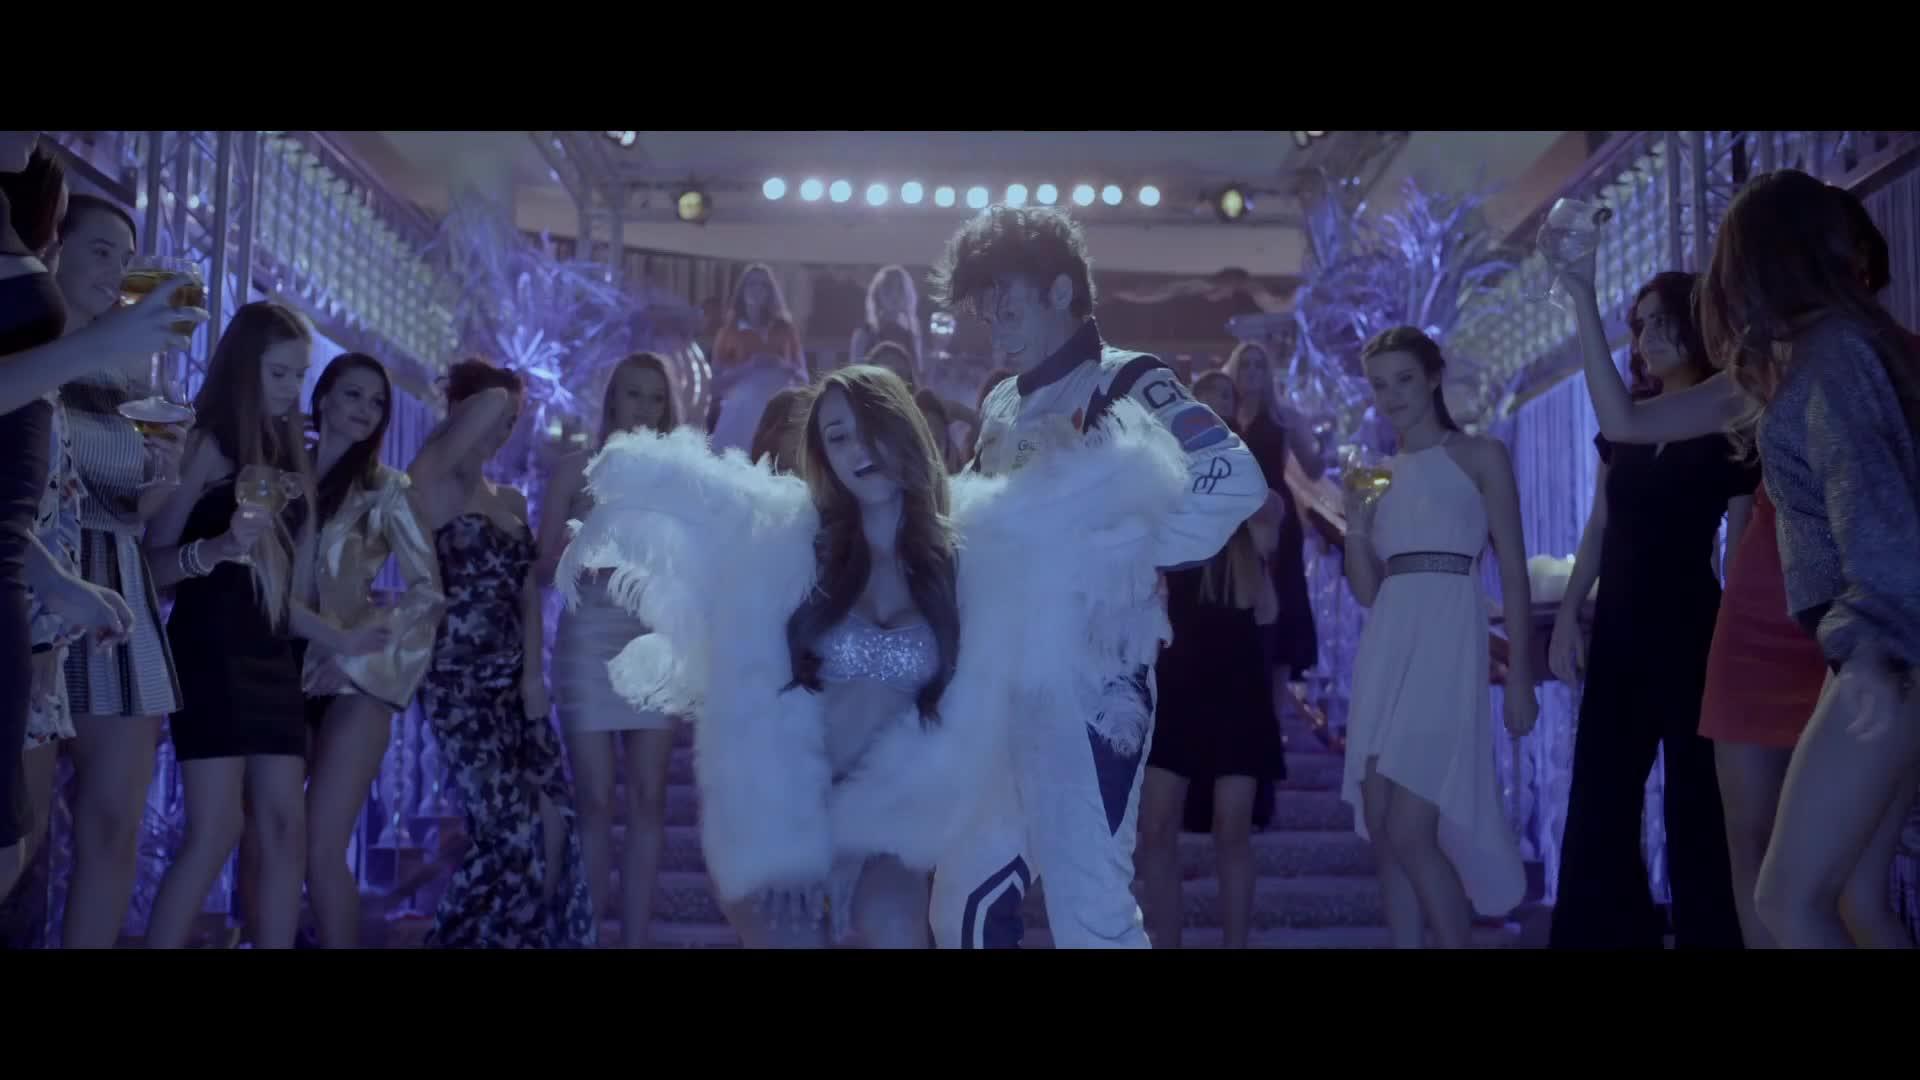 Yanet Garcia dancing in club dressed like an angel